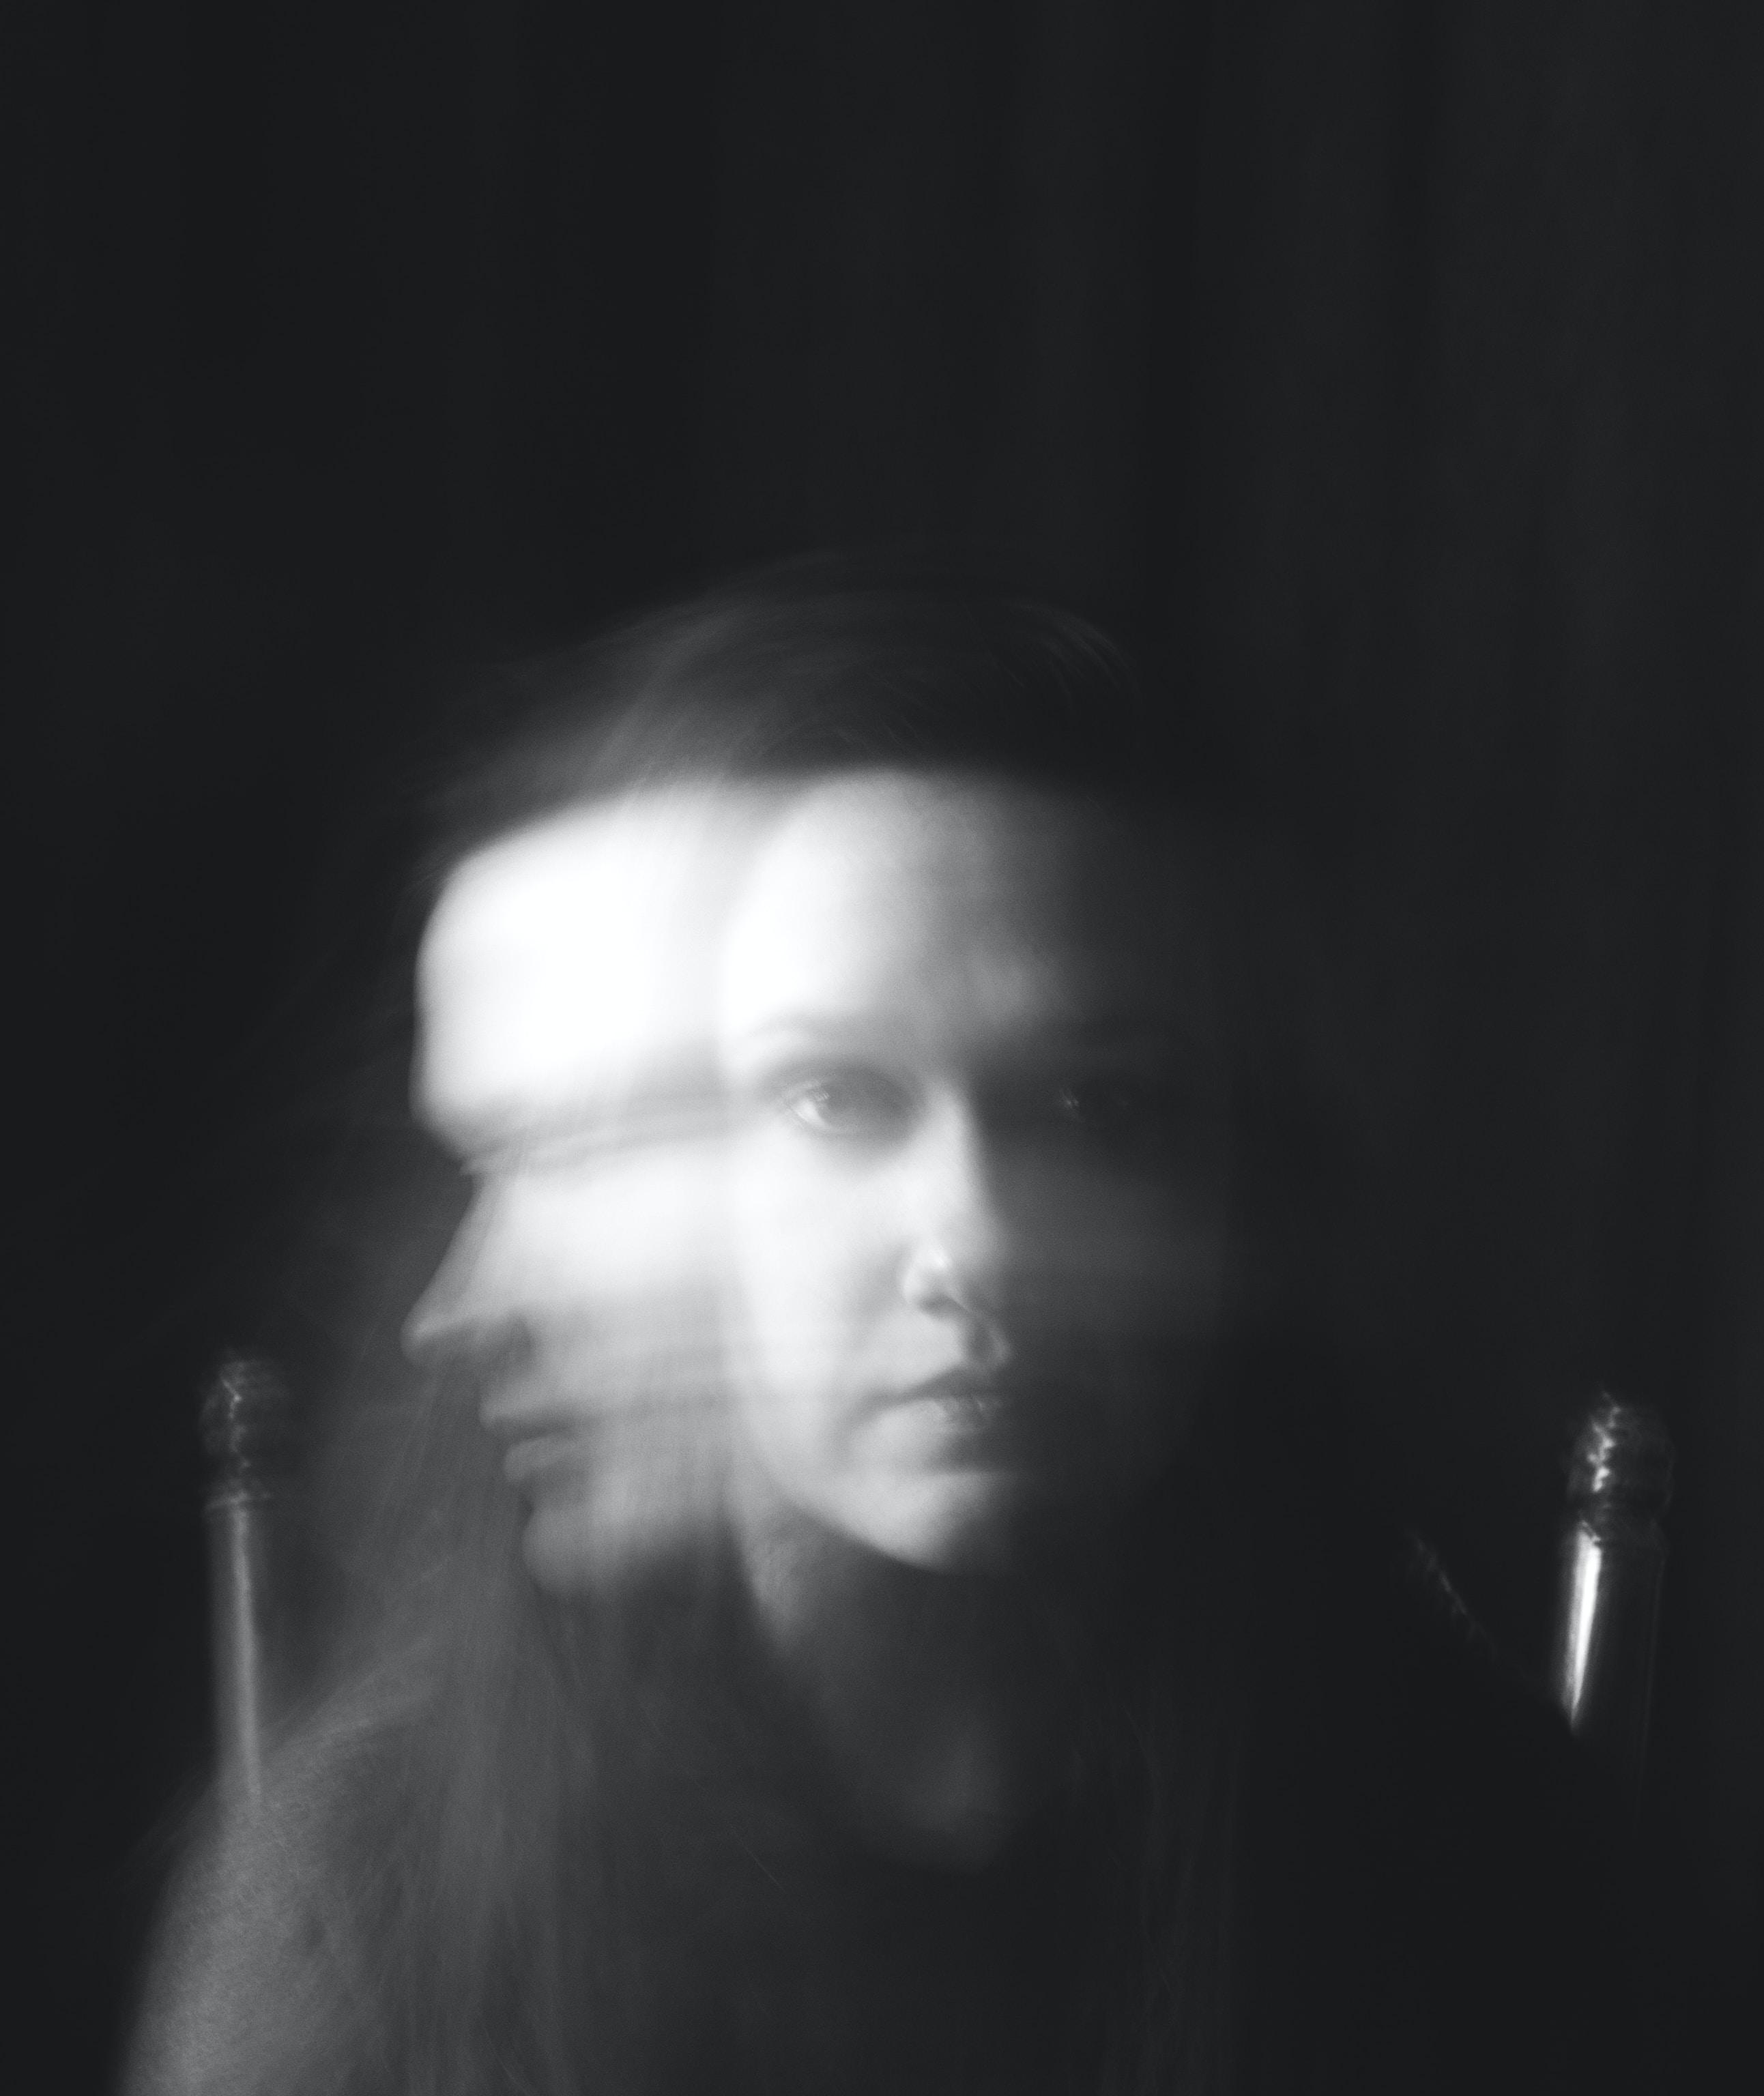 shade photo of woman